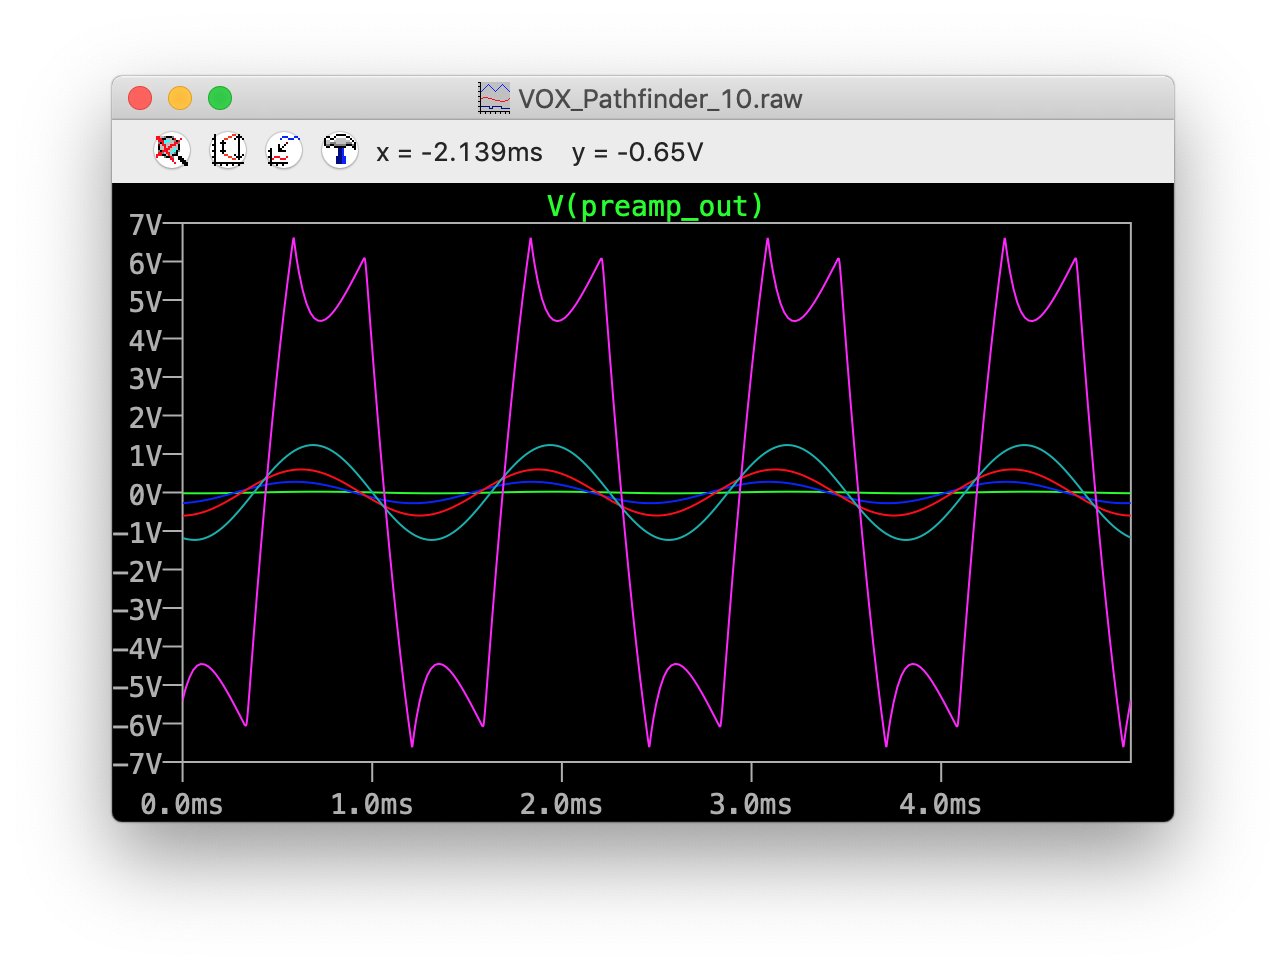 Vox Pathfinder 10 and Pathfinder 15 Simulation on vox tube amp mods, vox tube amp schematics, fender bassman schematic, fender champion 600 schematic, fender deluxe reverb schematic, vox ac15 layout, audio amplifier schematic, ac30 schematic, vox v9158 15r, vox vt50 amp schematics, vox vt 50 amps, vox amp diagram, blues jr schematic, vox tonelab le power cable diagram, small ice machine schematic, pcb schematic,